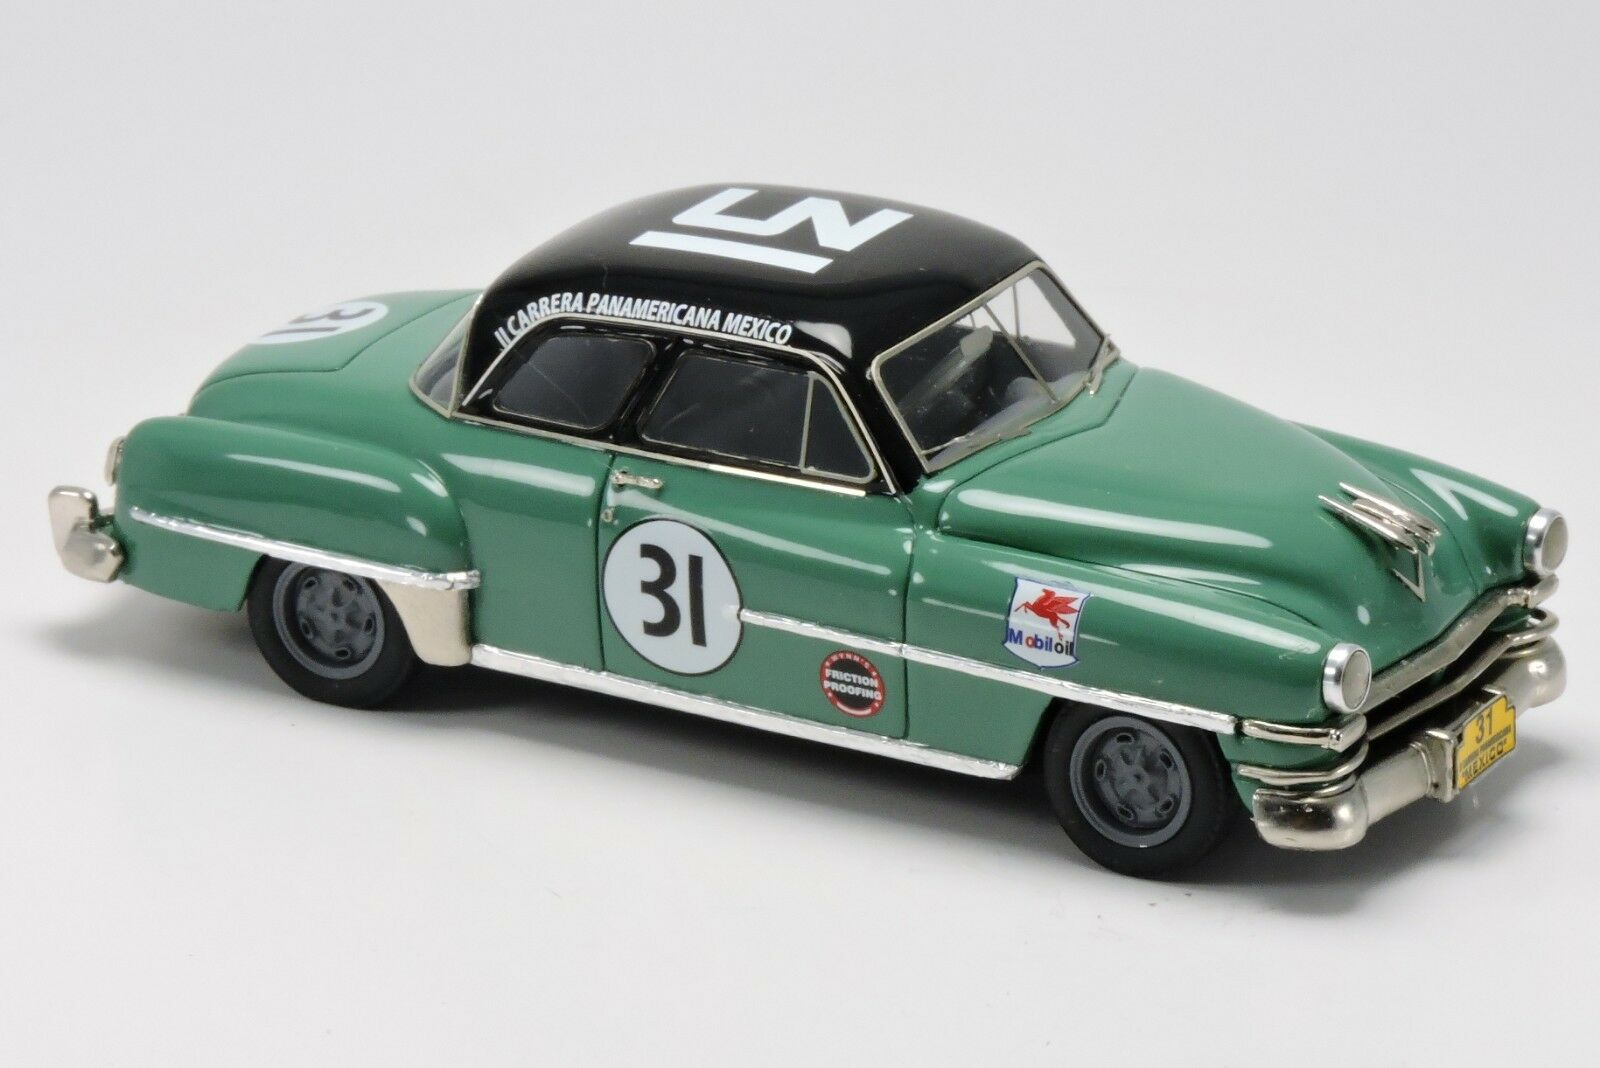 kit Chrysler Saratoga II Carrera Panamericana 1951  31 - Arena Models kit 1 43